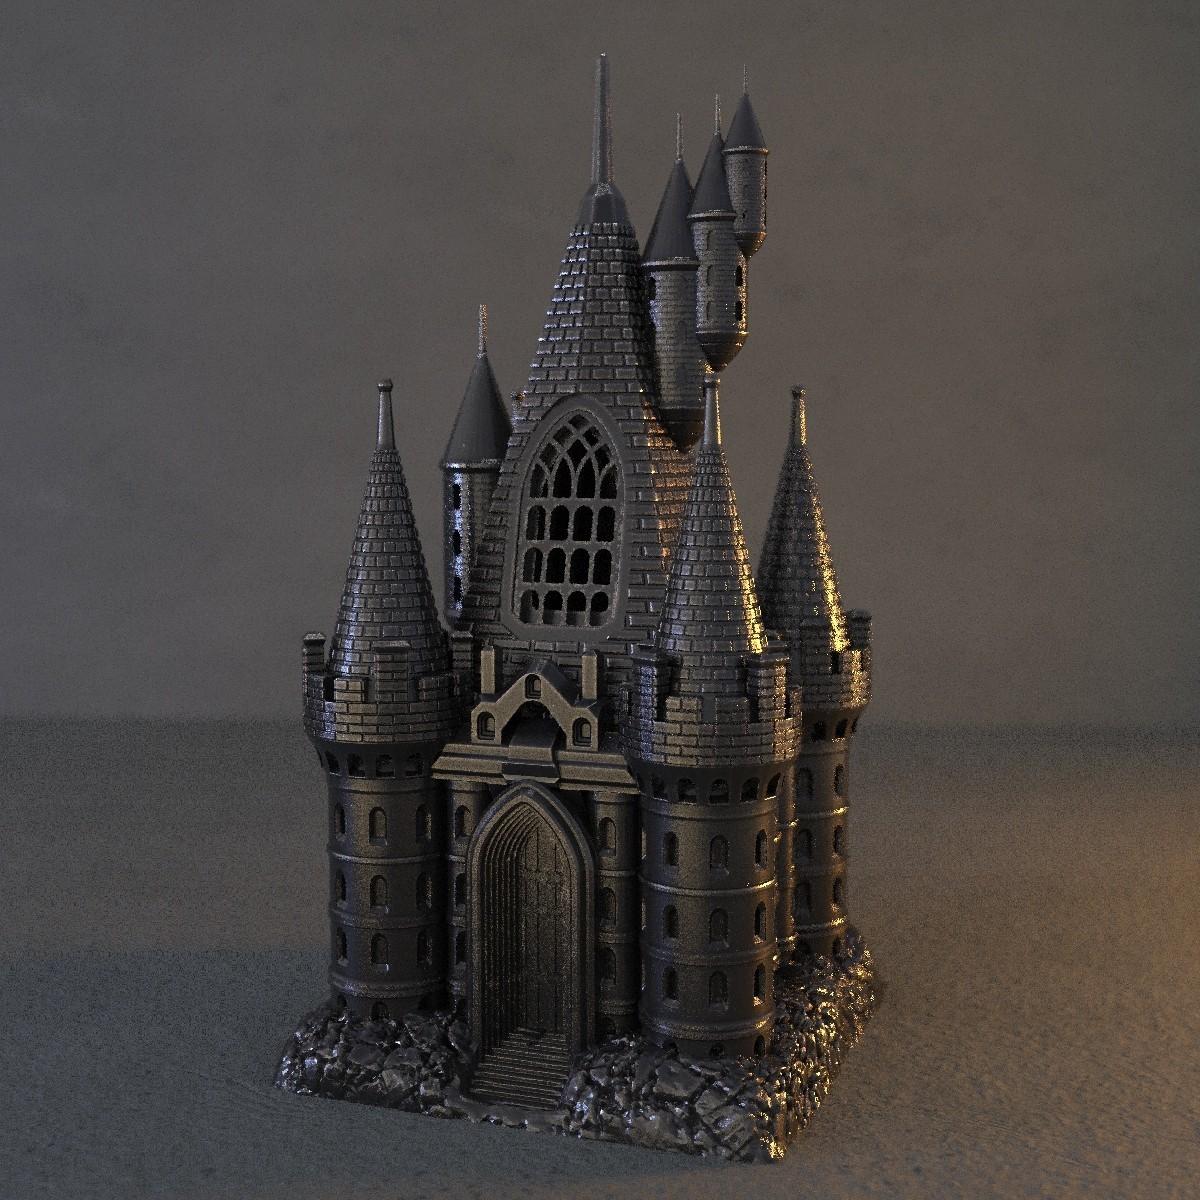 5.jpg Download OBJ file The Five Tower Hall • 3D printable template, tolgaaxu